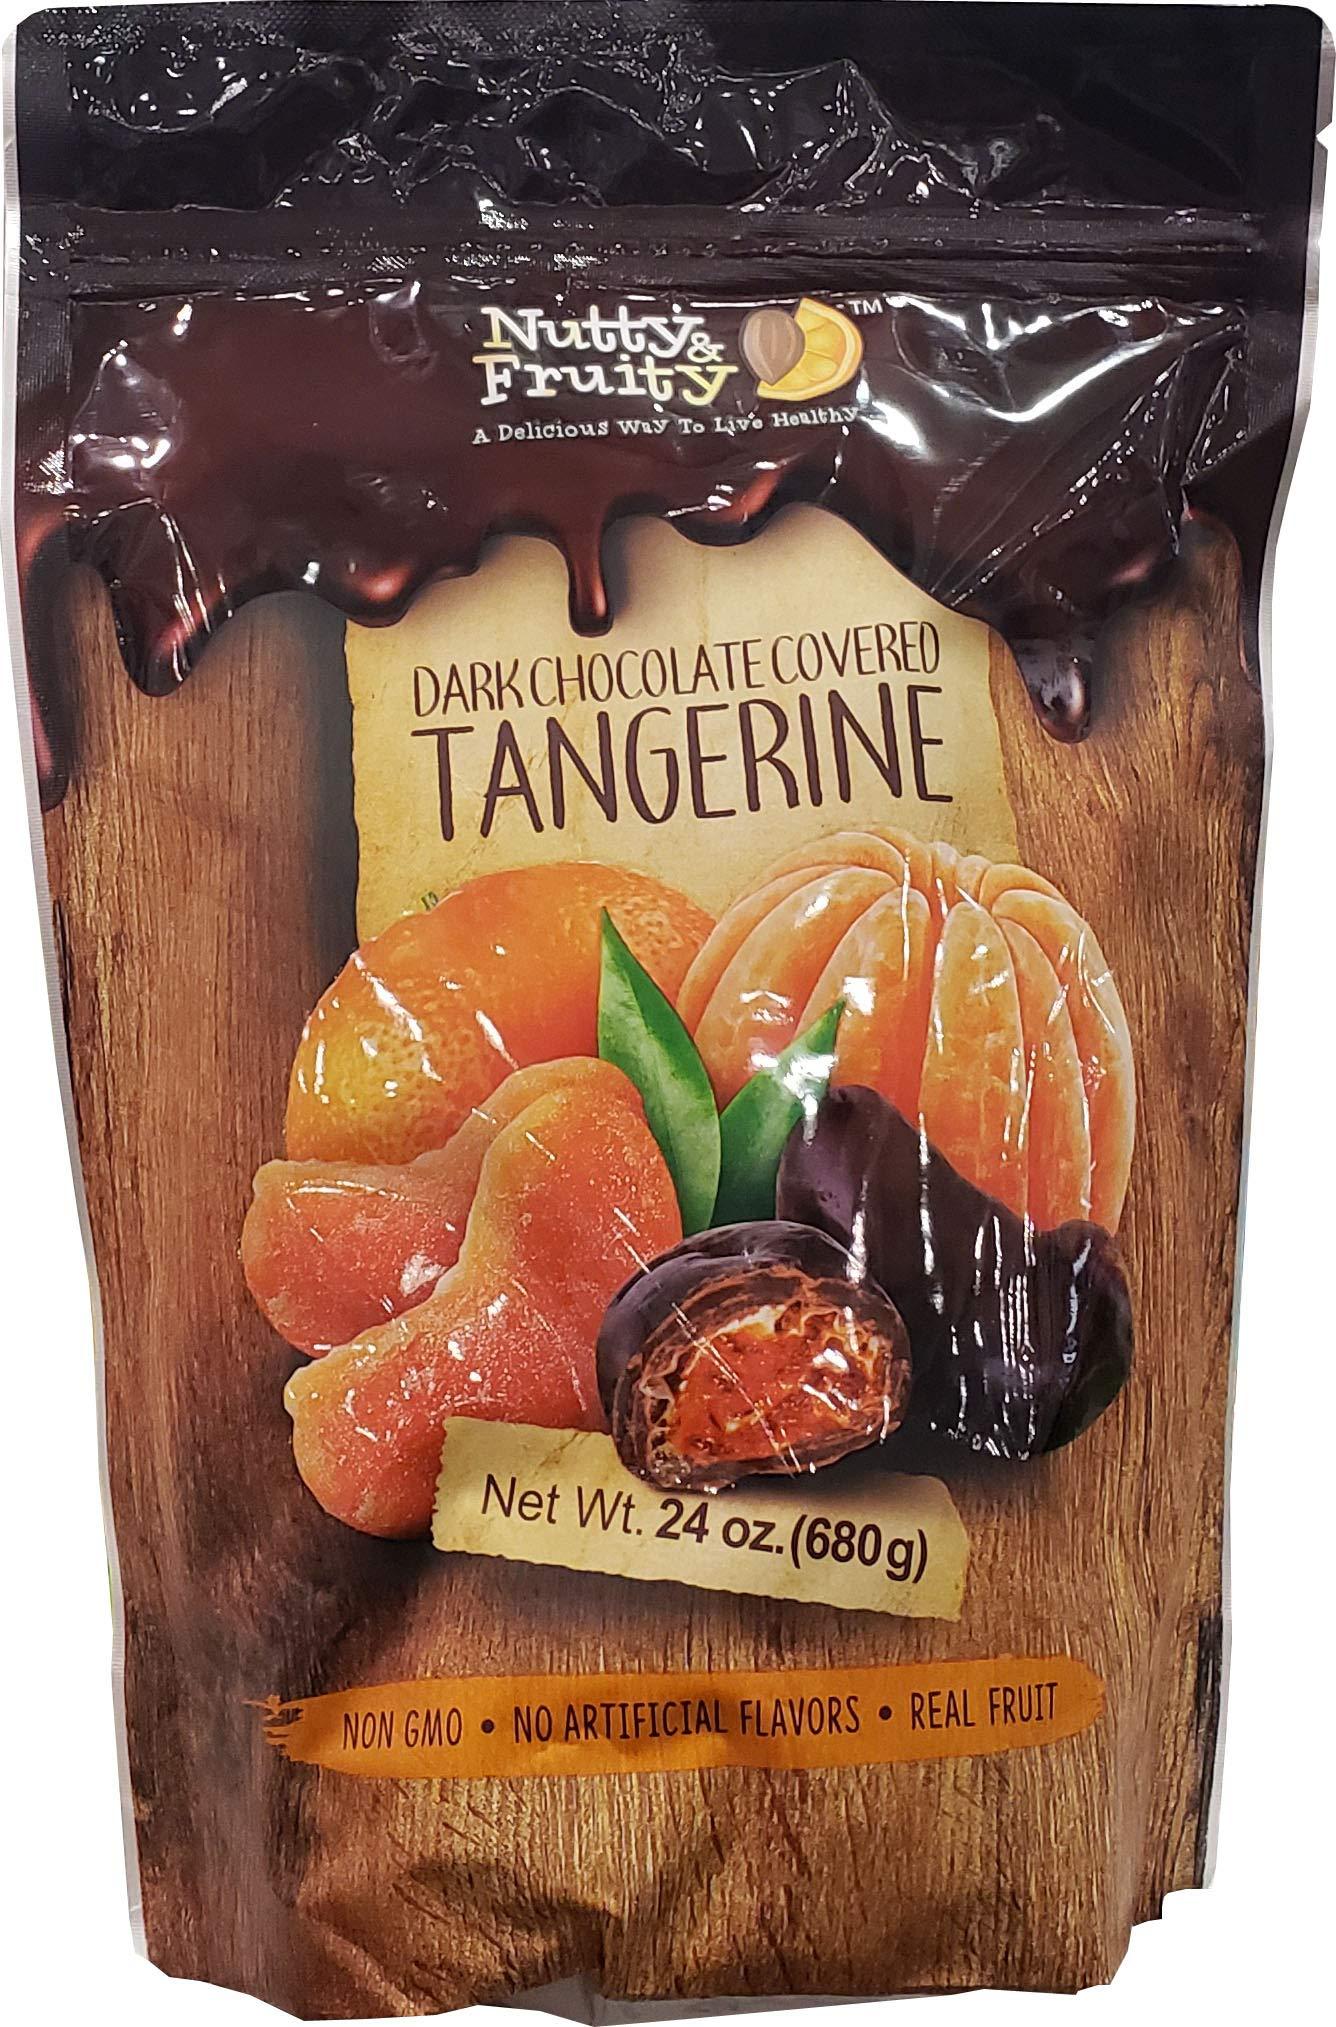 Nutty & Fruity Dark Chocolate Tangerines, 24 oz